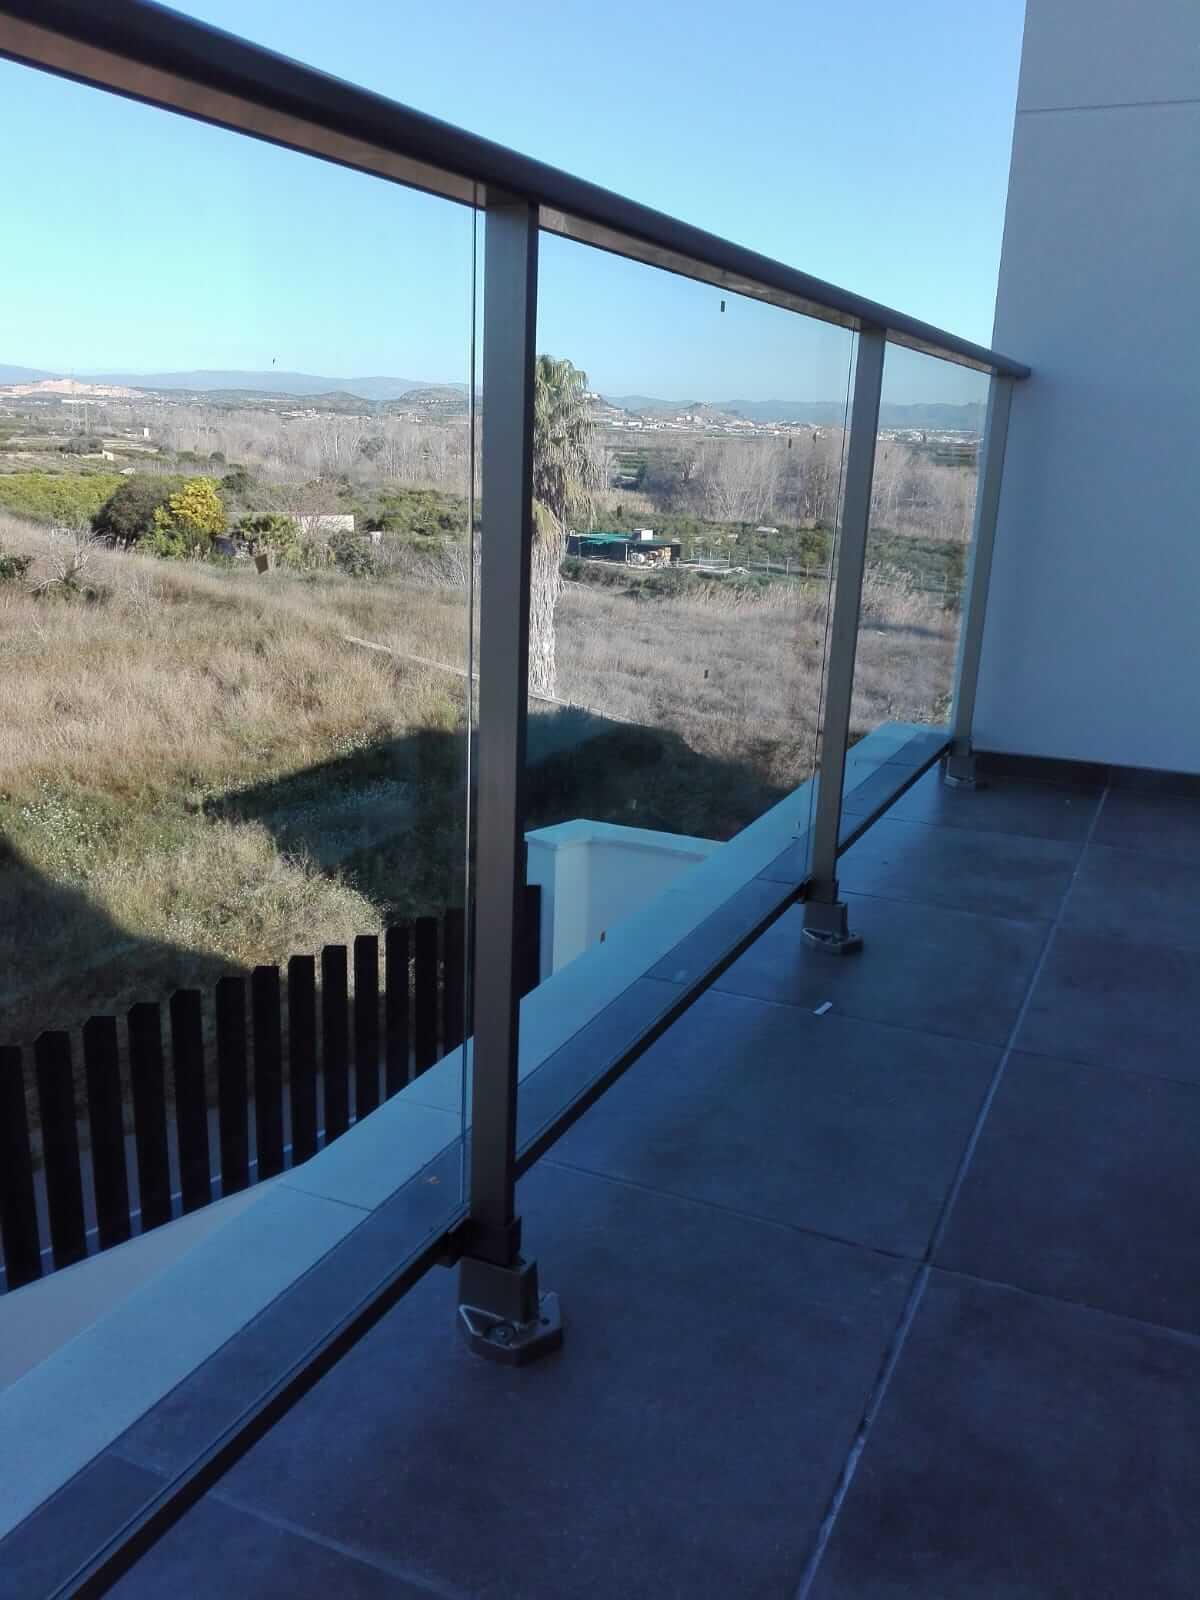 Barandilla de balcón de acero con cristales transparentes